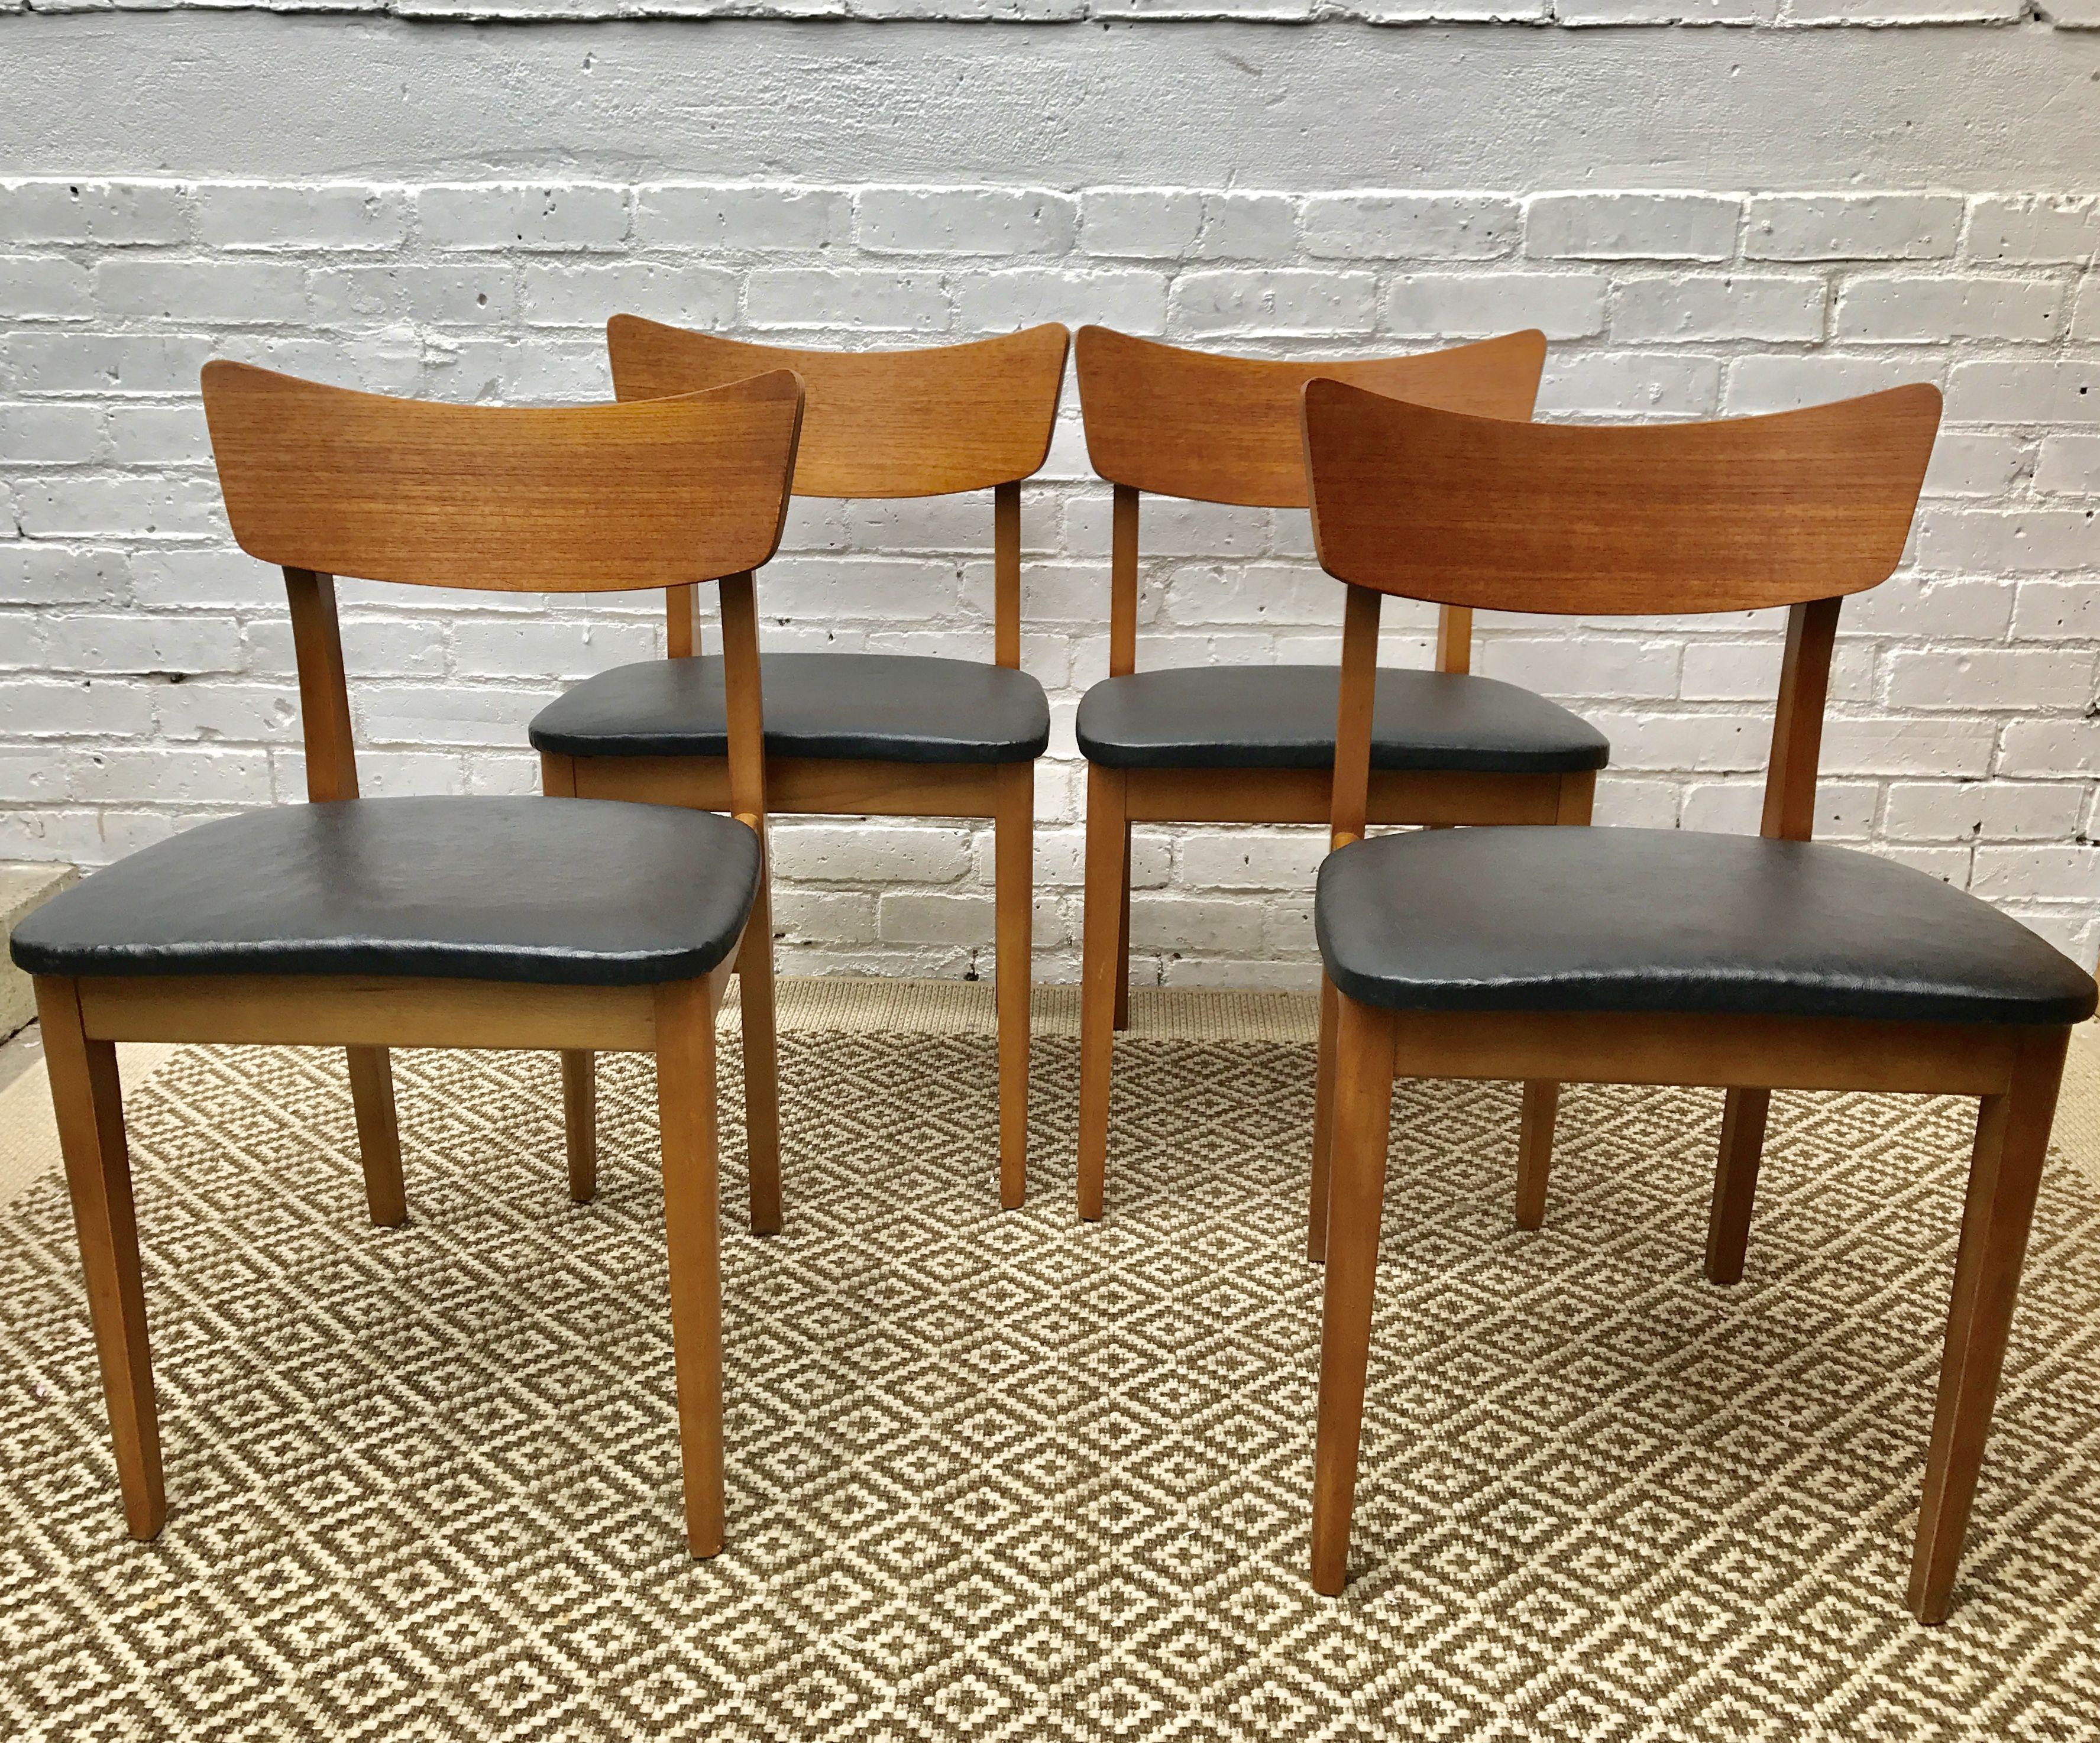 Fine 4 Mid Century Dining Chairs Black Vinyl Seats Dining Creativecarmelina Interior Chair Design Creativecarmelinacom